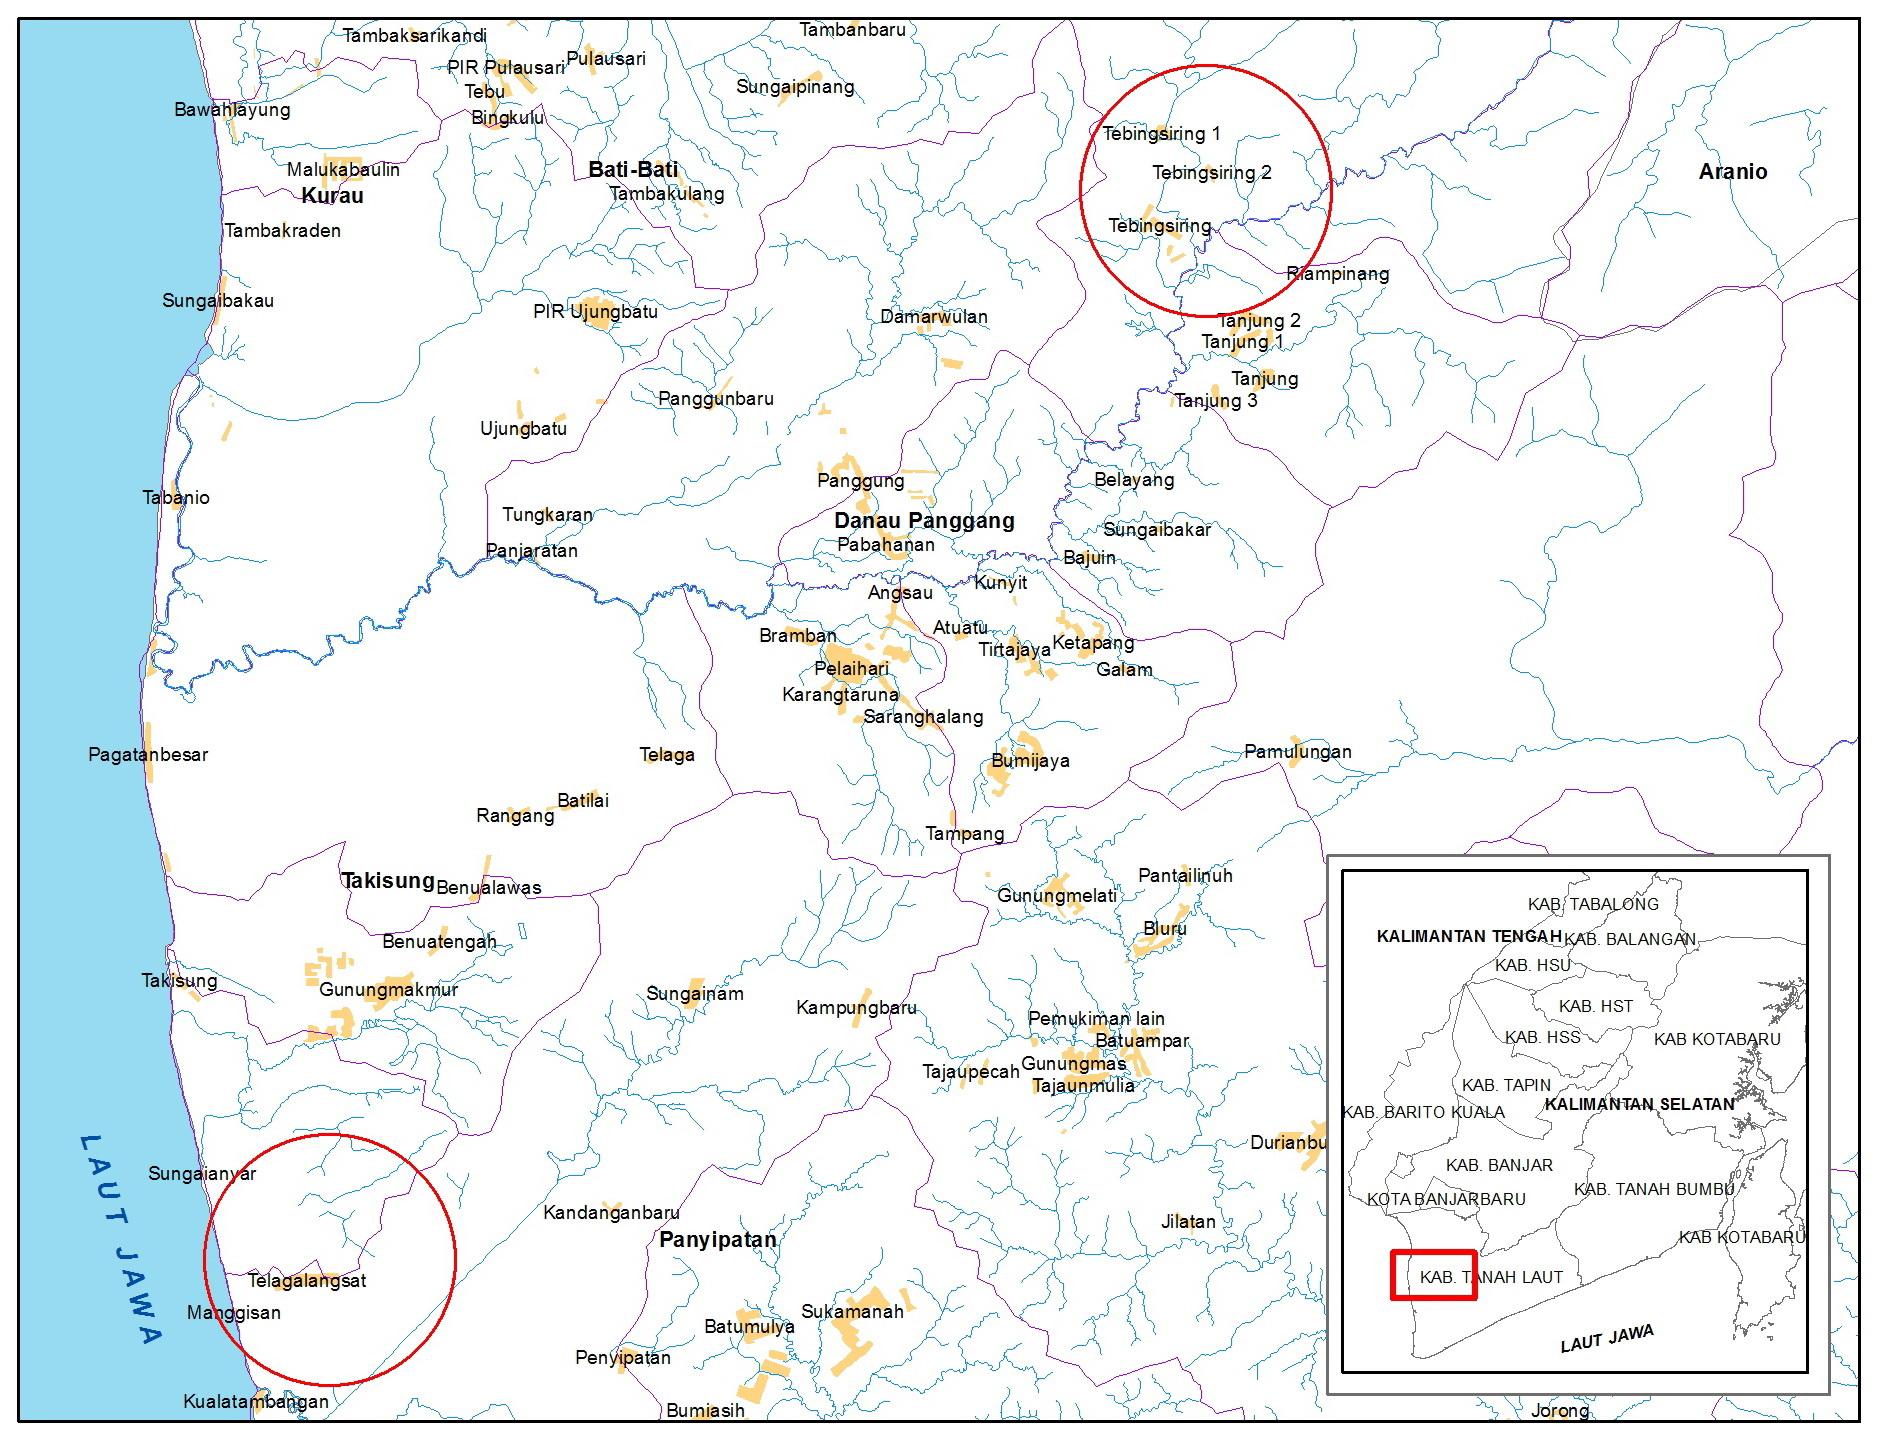 Lokasi Desa Tebing Siring di DAS Tabunio dan Desa Telaga Langsat di DAS Gayam, wilayah kerja BPDASHL Barito (Disusun : Nolianto Ananda)